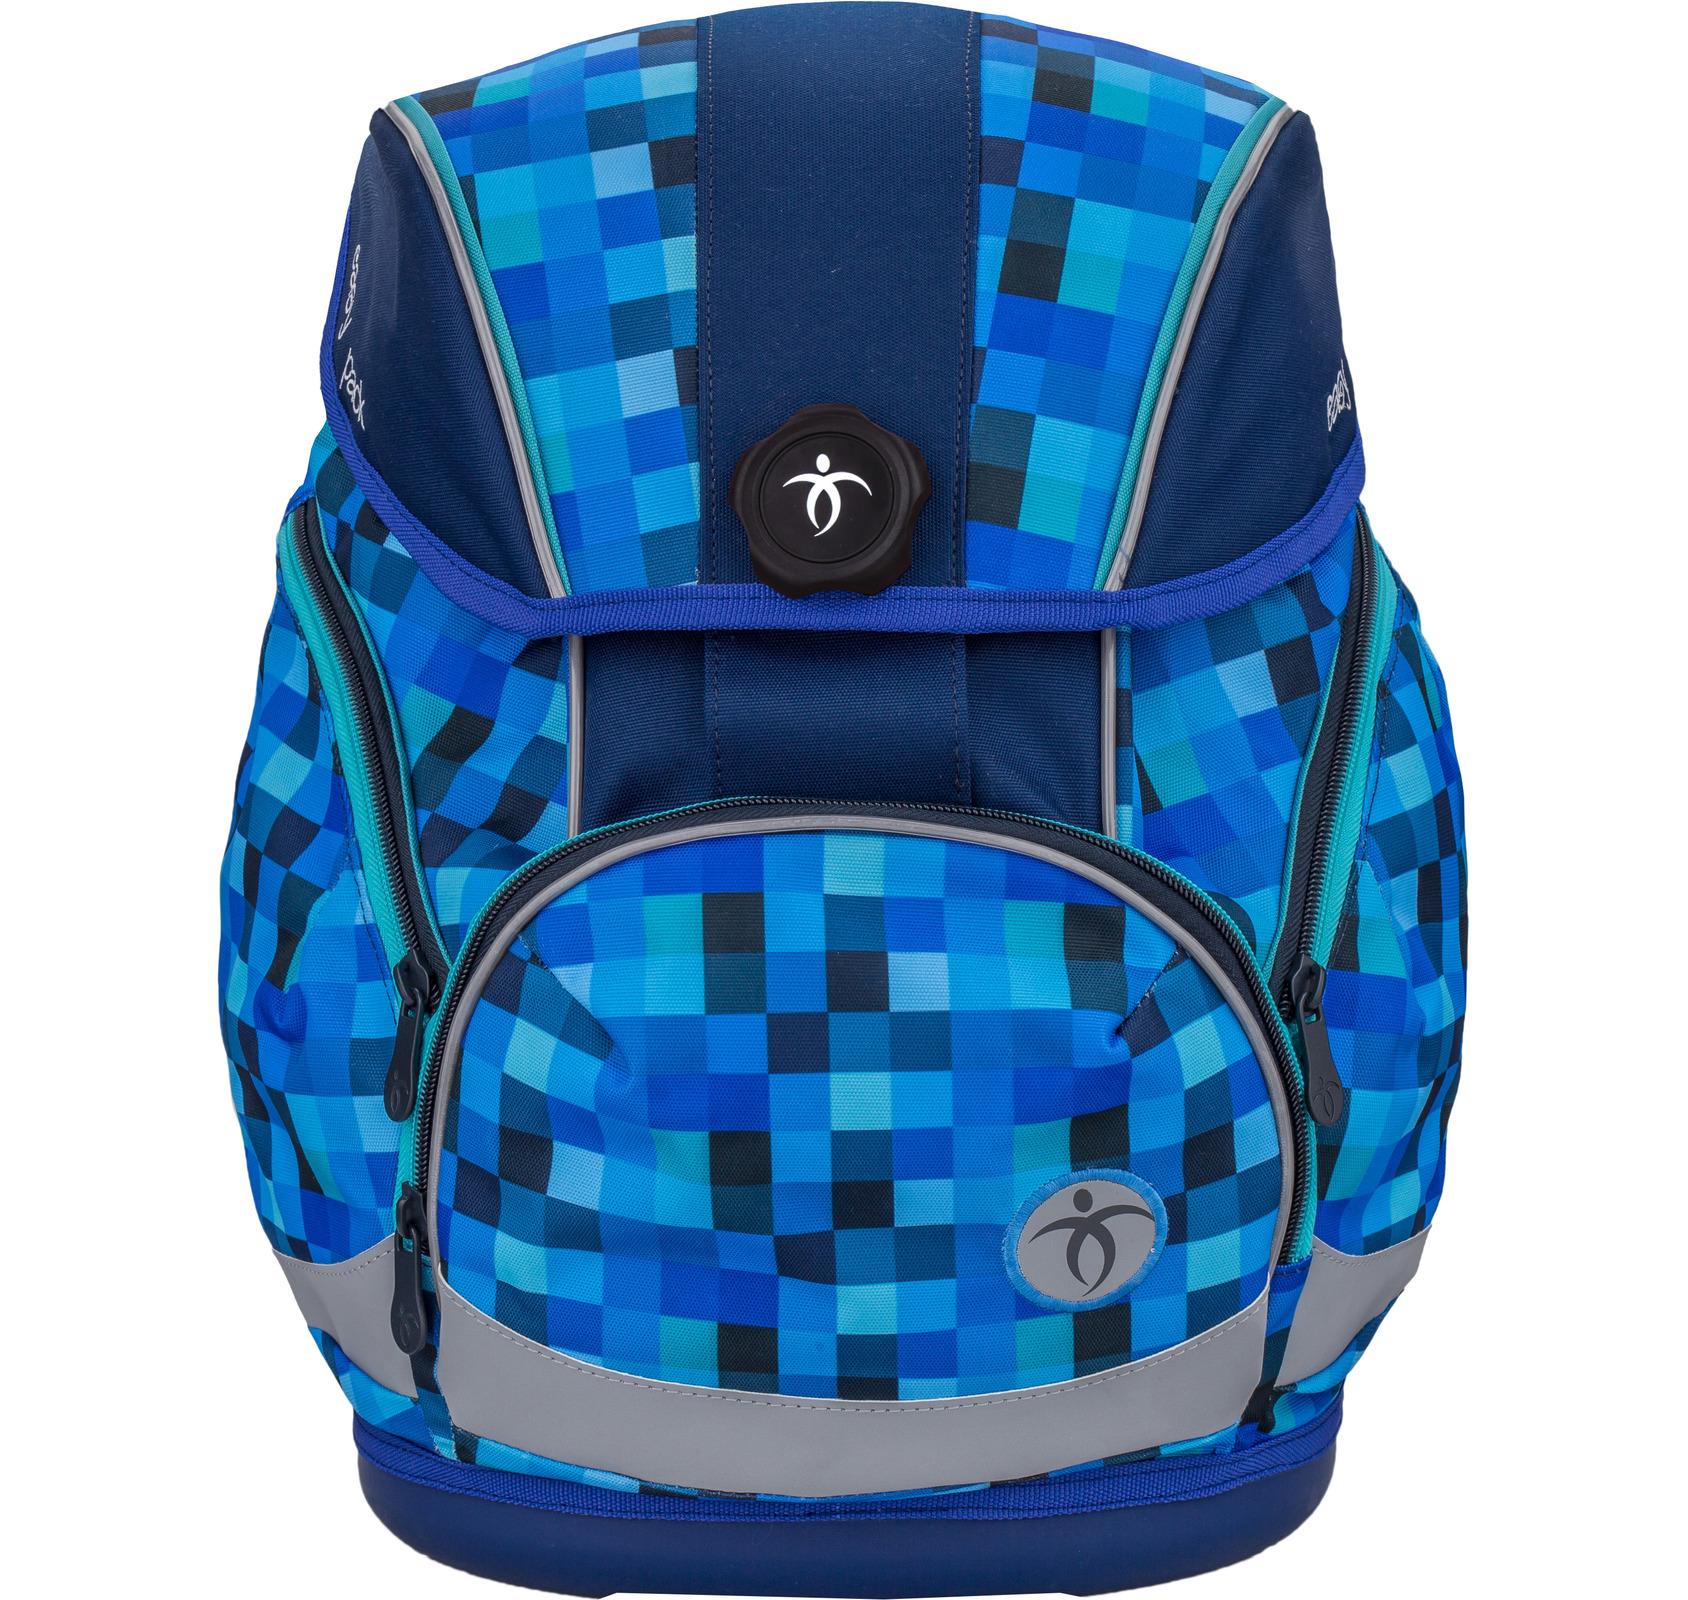 Ранец Belmil EASY PACK 404-40 BLUE PACK + мешок, - фото 1